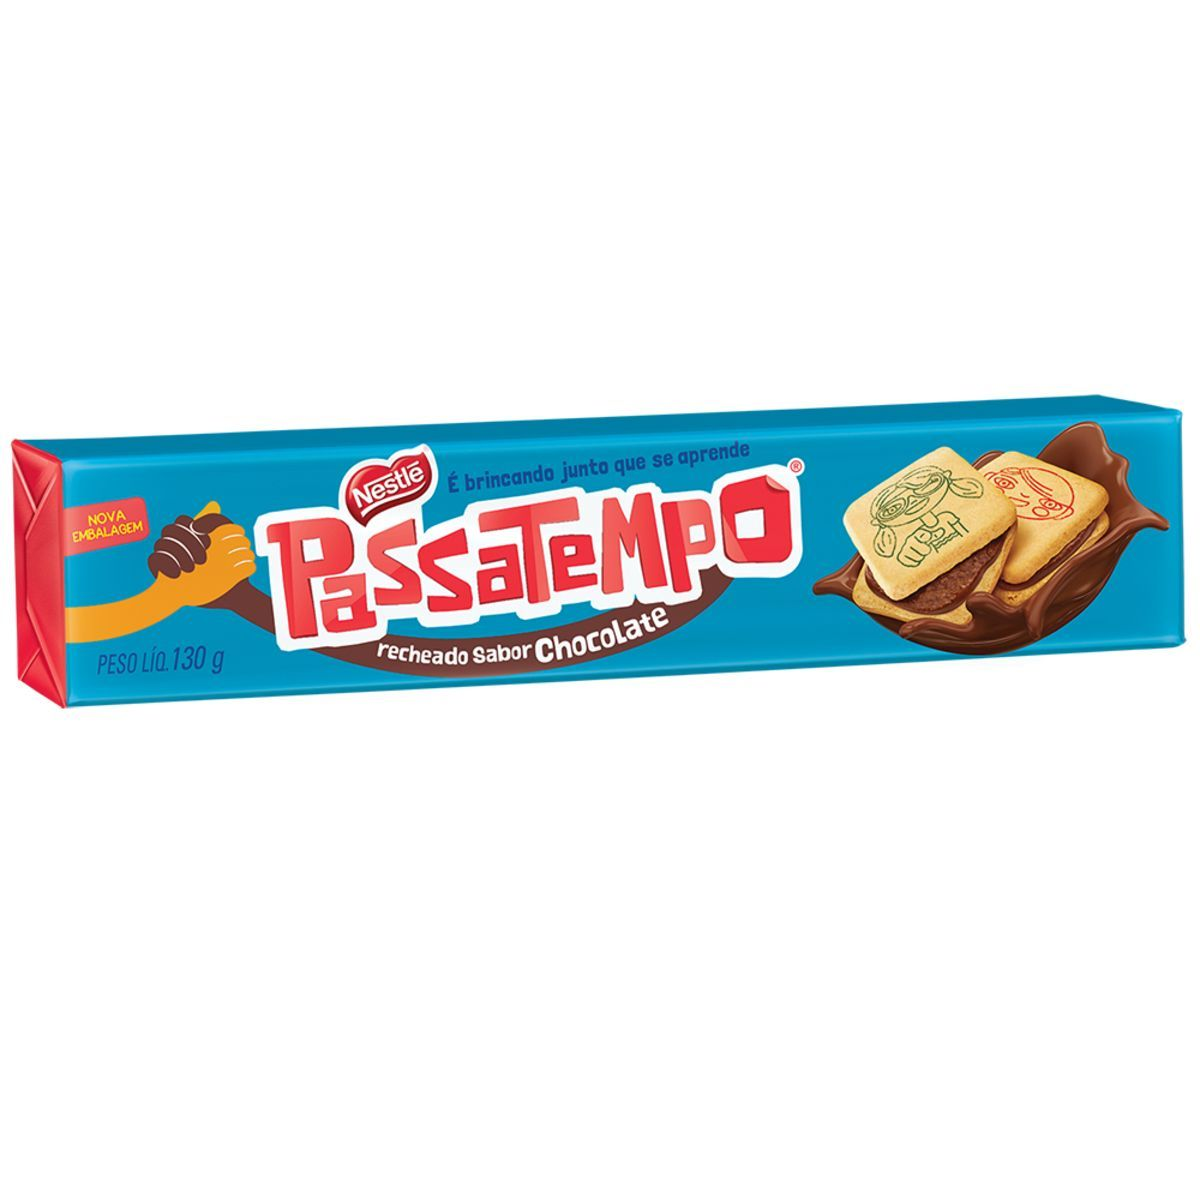 BISCOITO RECHEADO CHOCOLATE 130G PASSATEMPO NESTLE